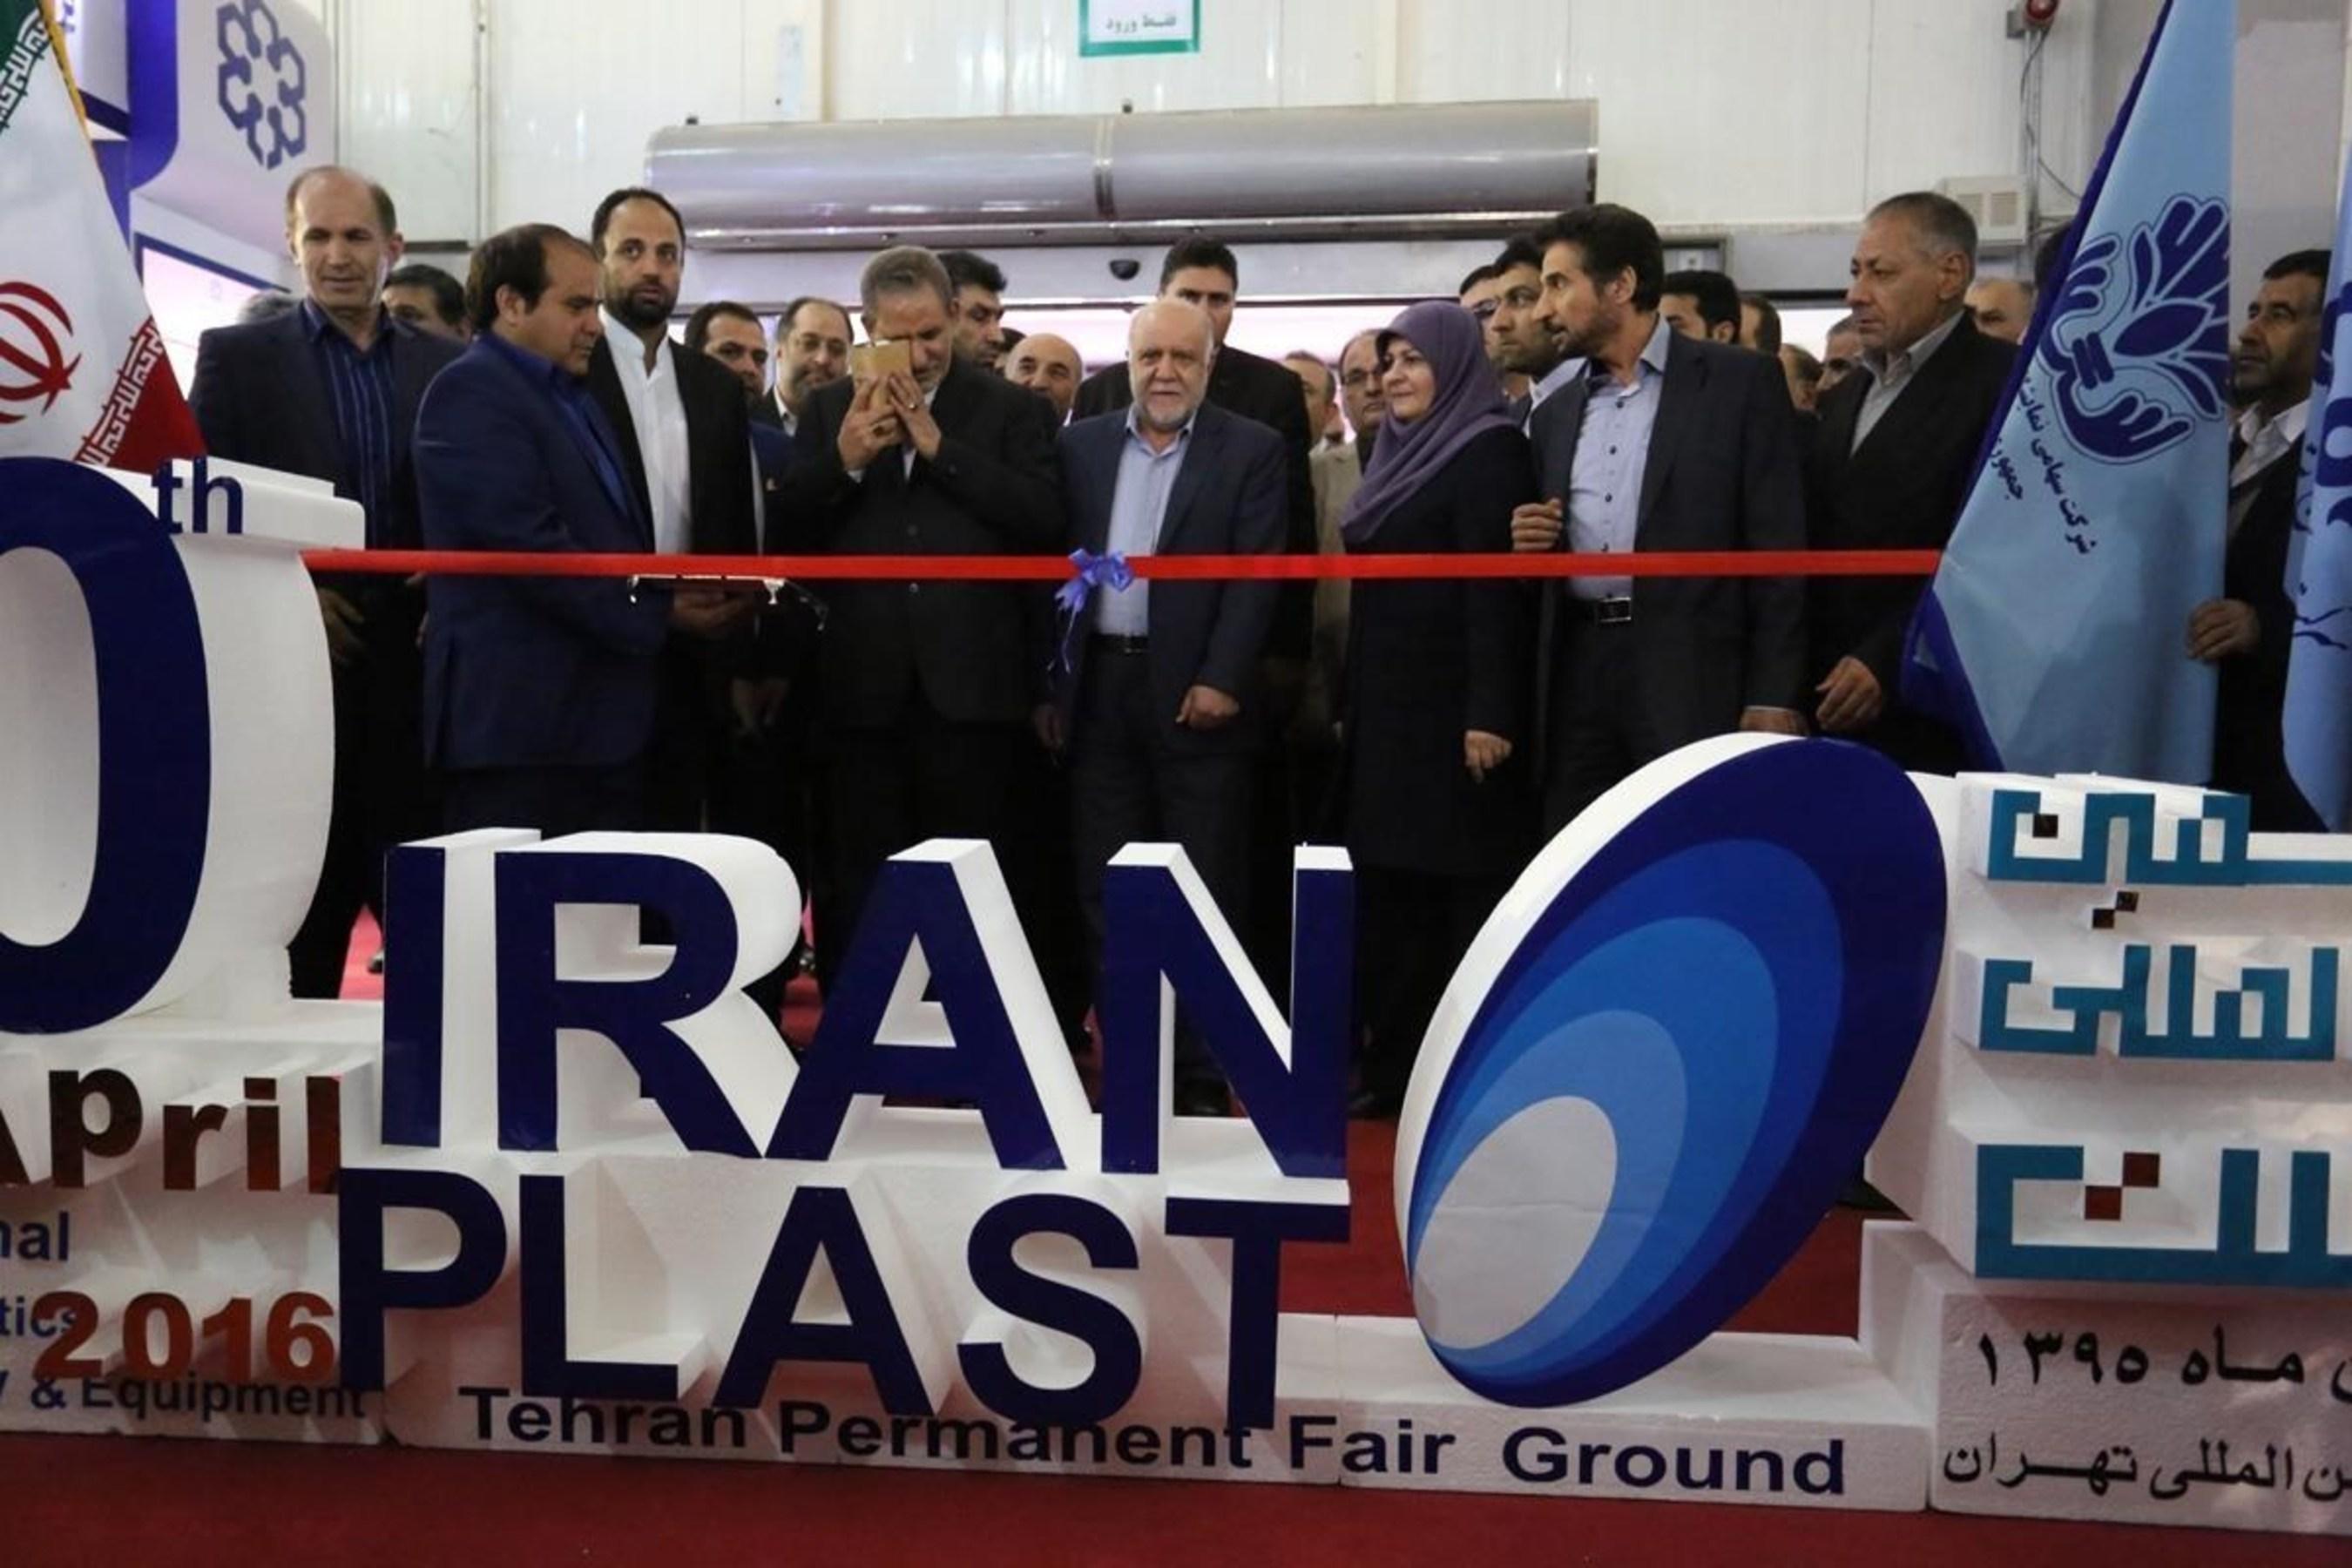 Iran Plast Exibition 2016